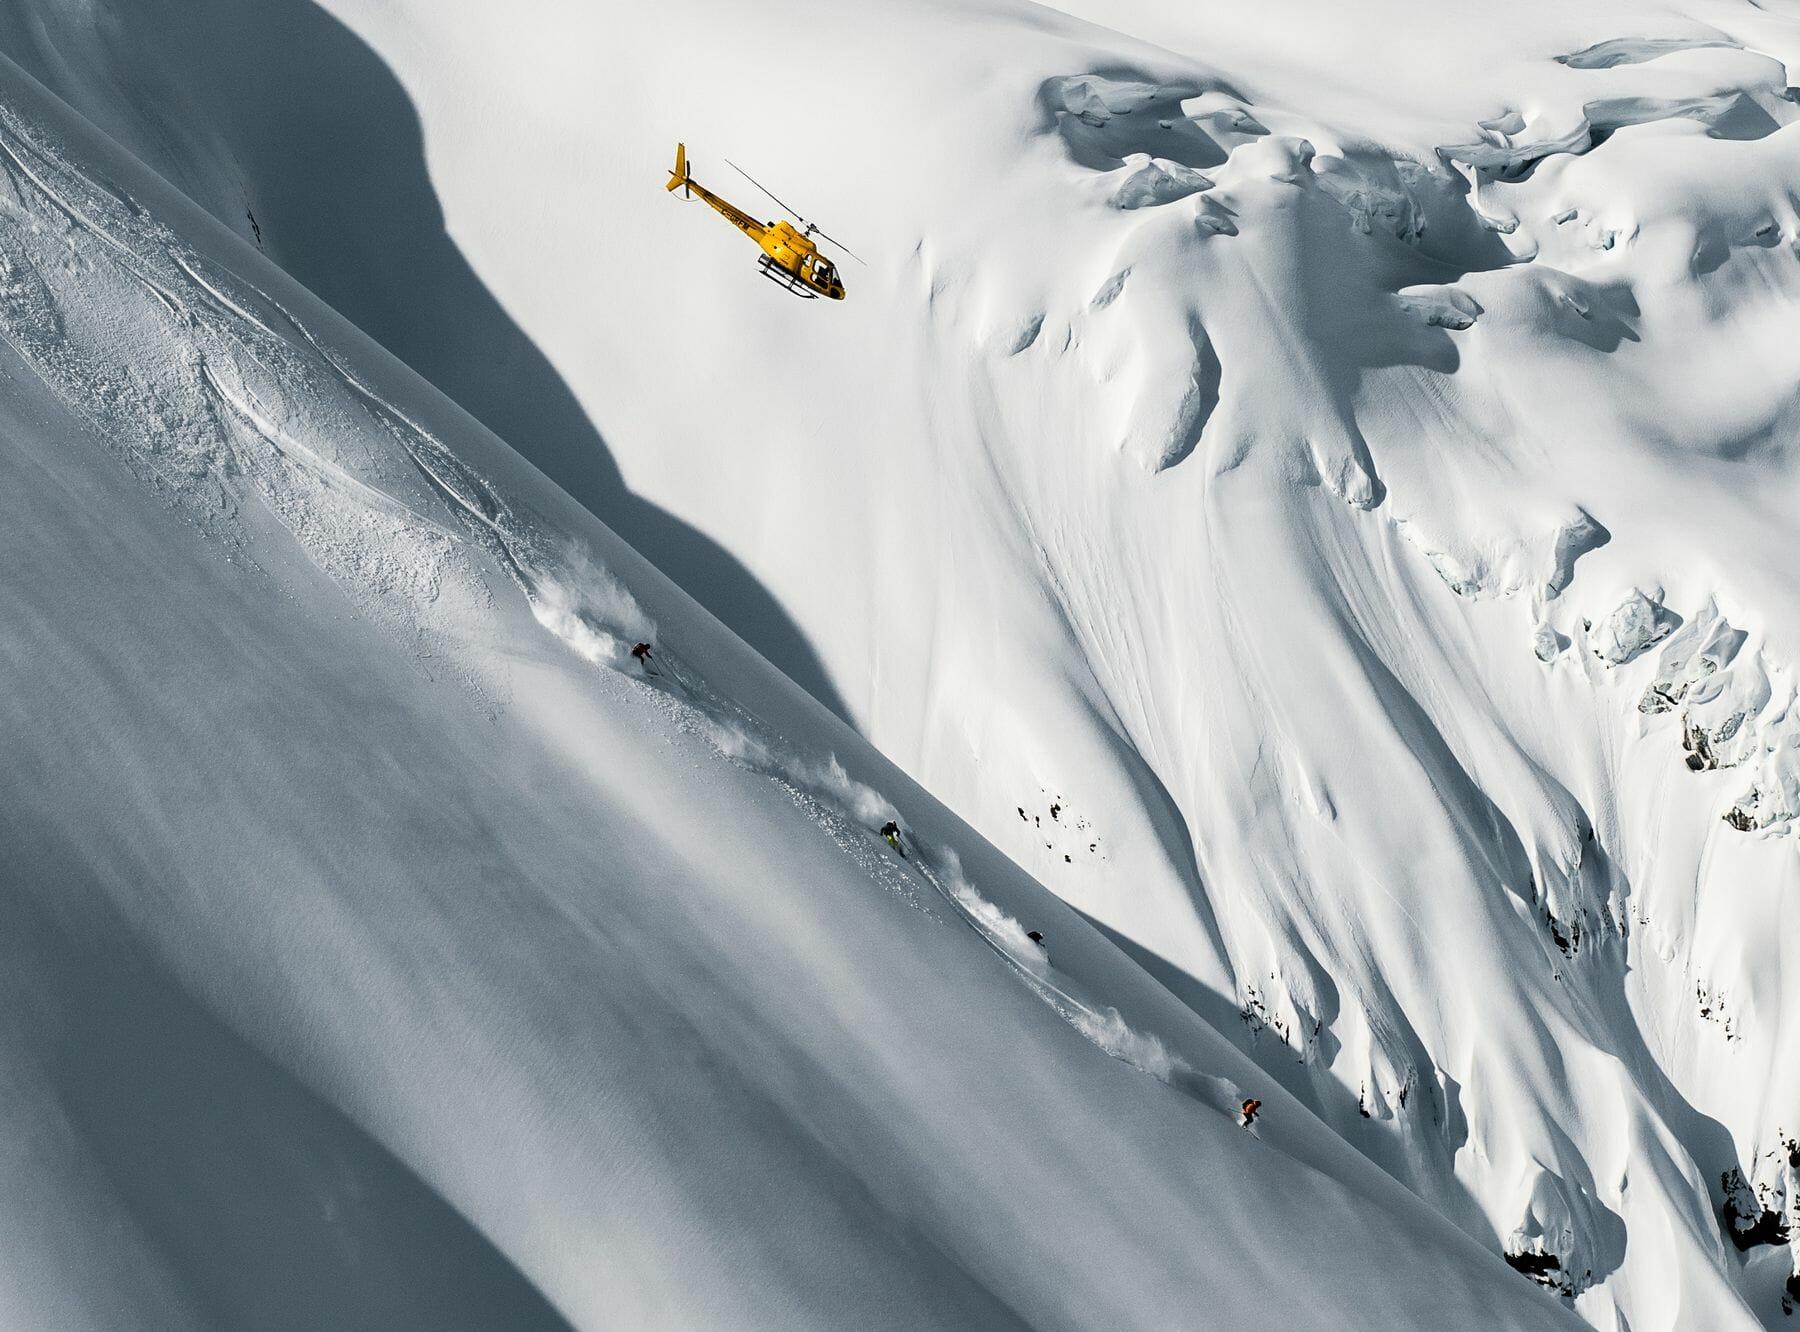 Terrain de ski dans un cadre alpin.